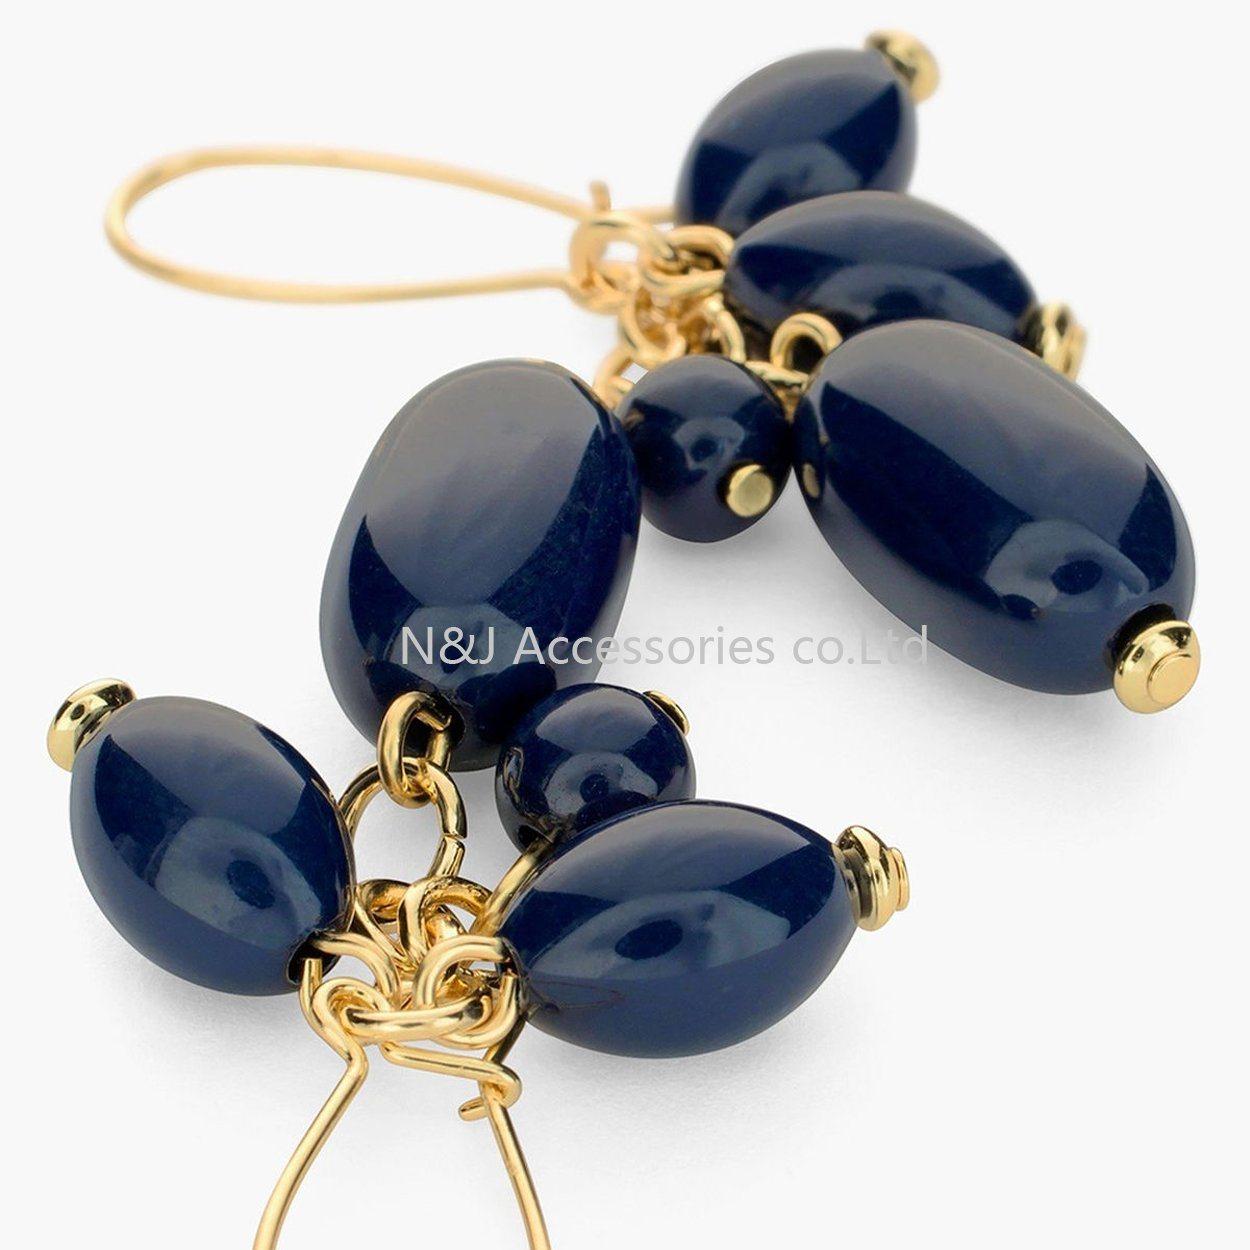 Handmade Dangle Earrings Jewelry Acrylic Resin Accessories Drop Earring Factory Wholesale